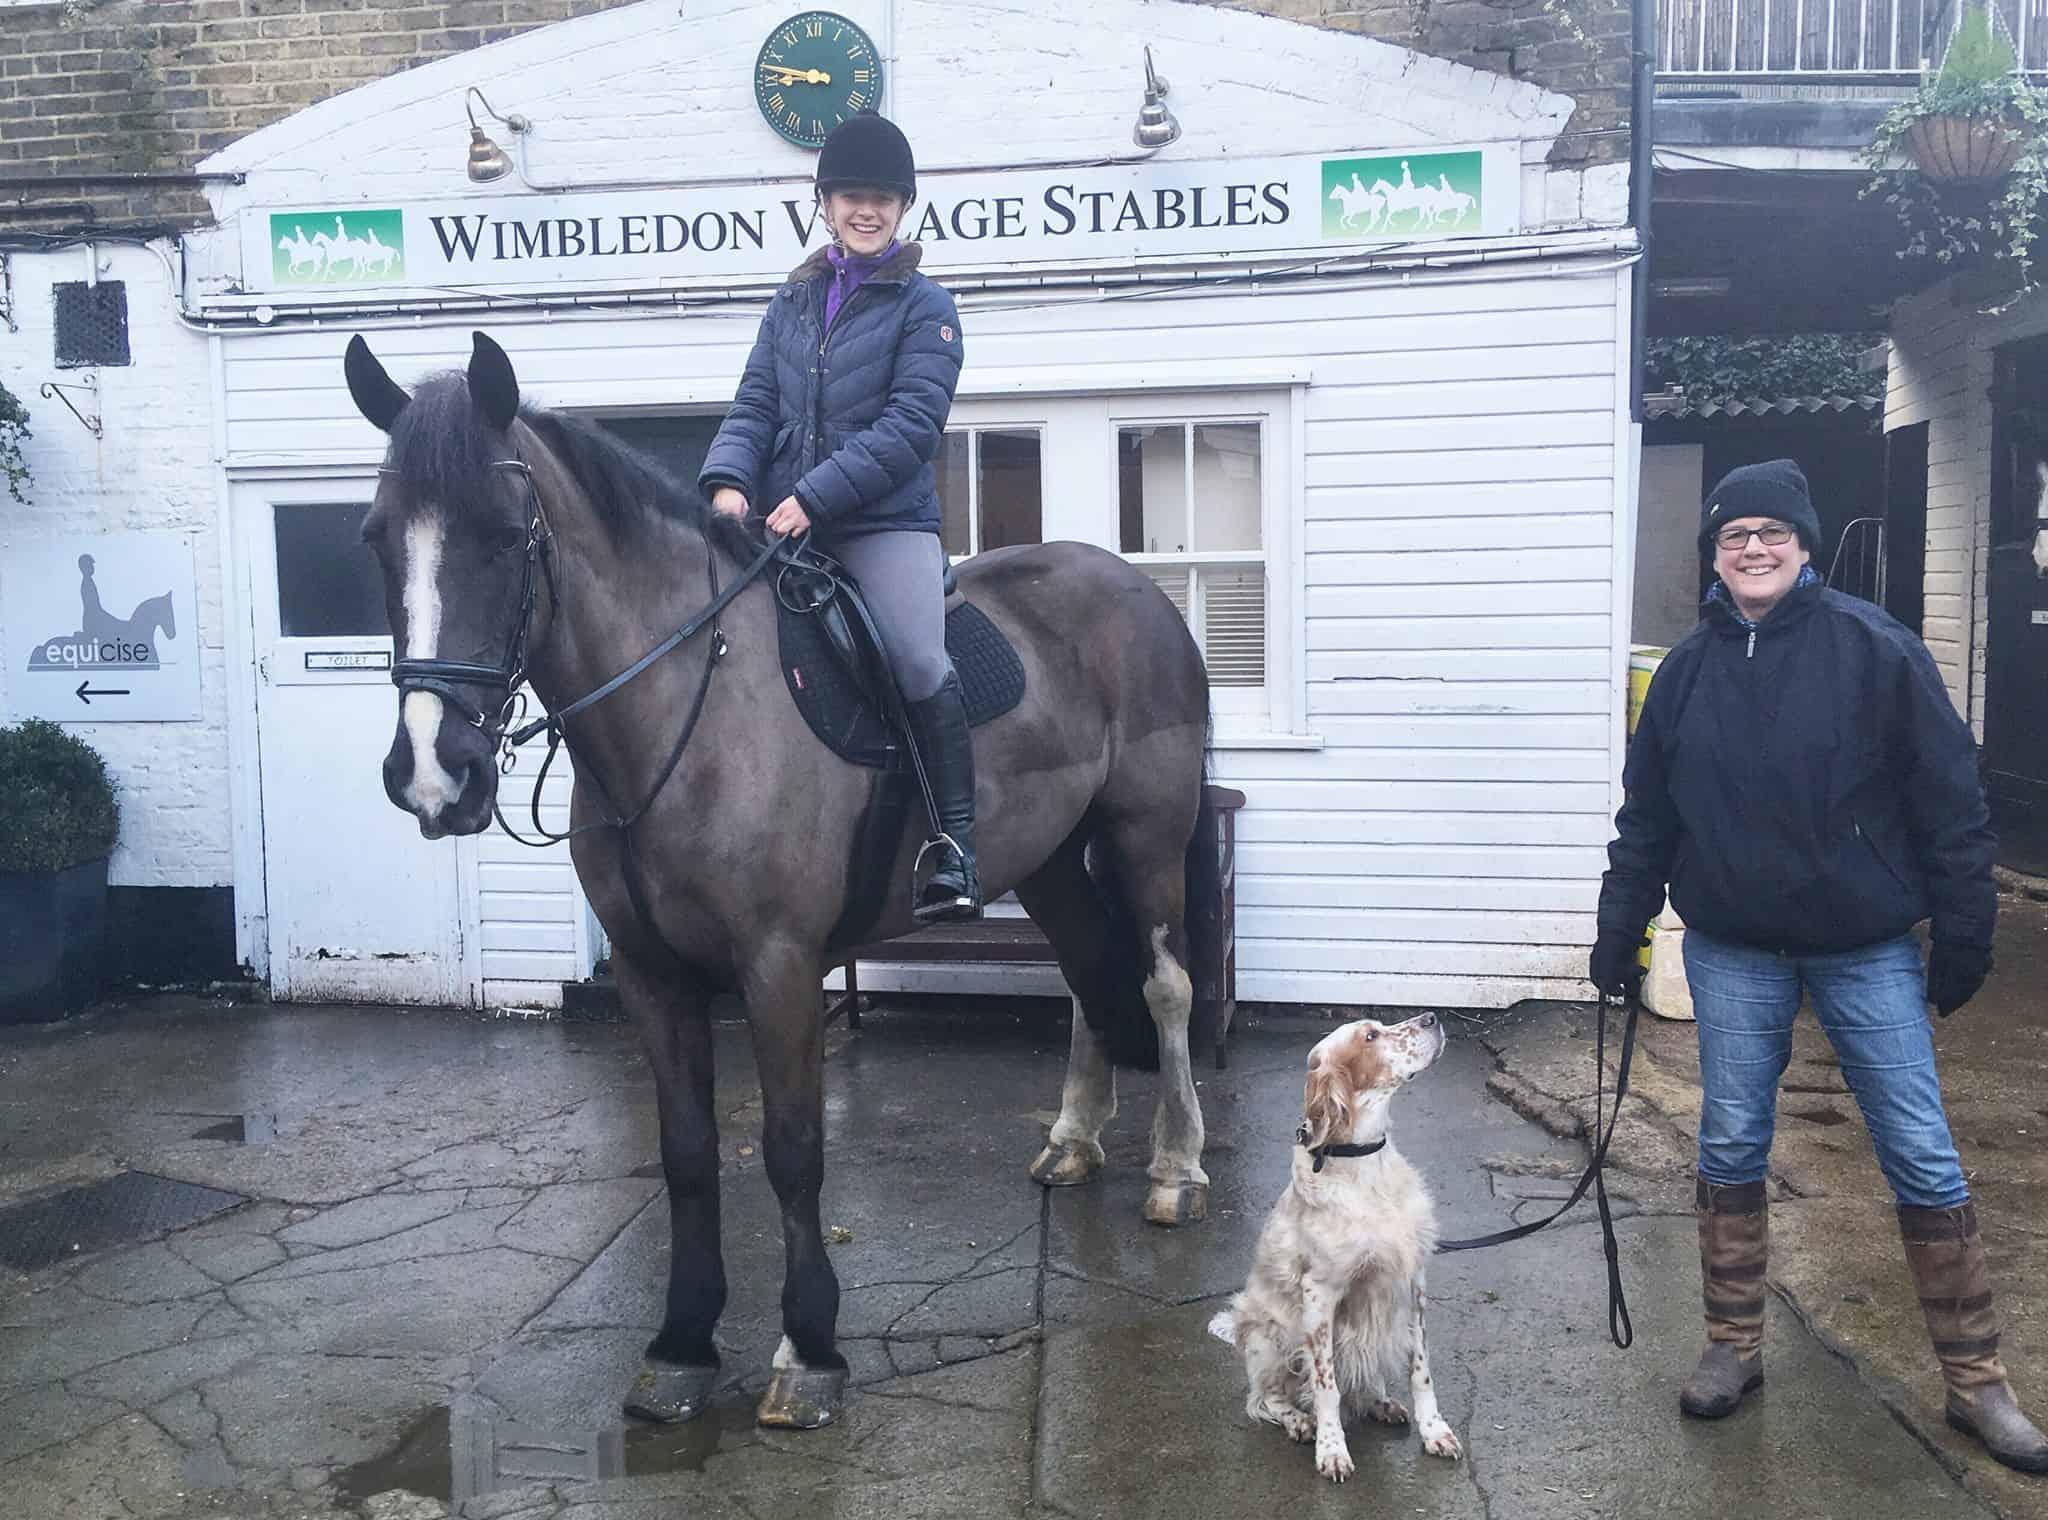 Wimbledon Common Dogs & Horses Training Session